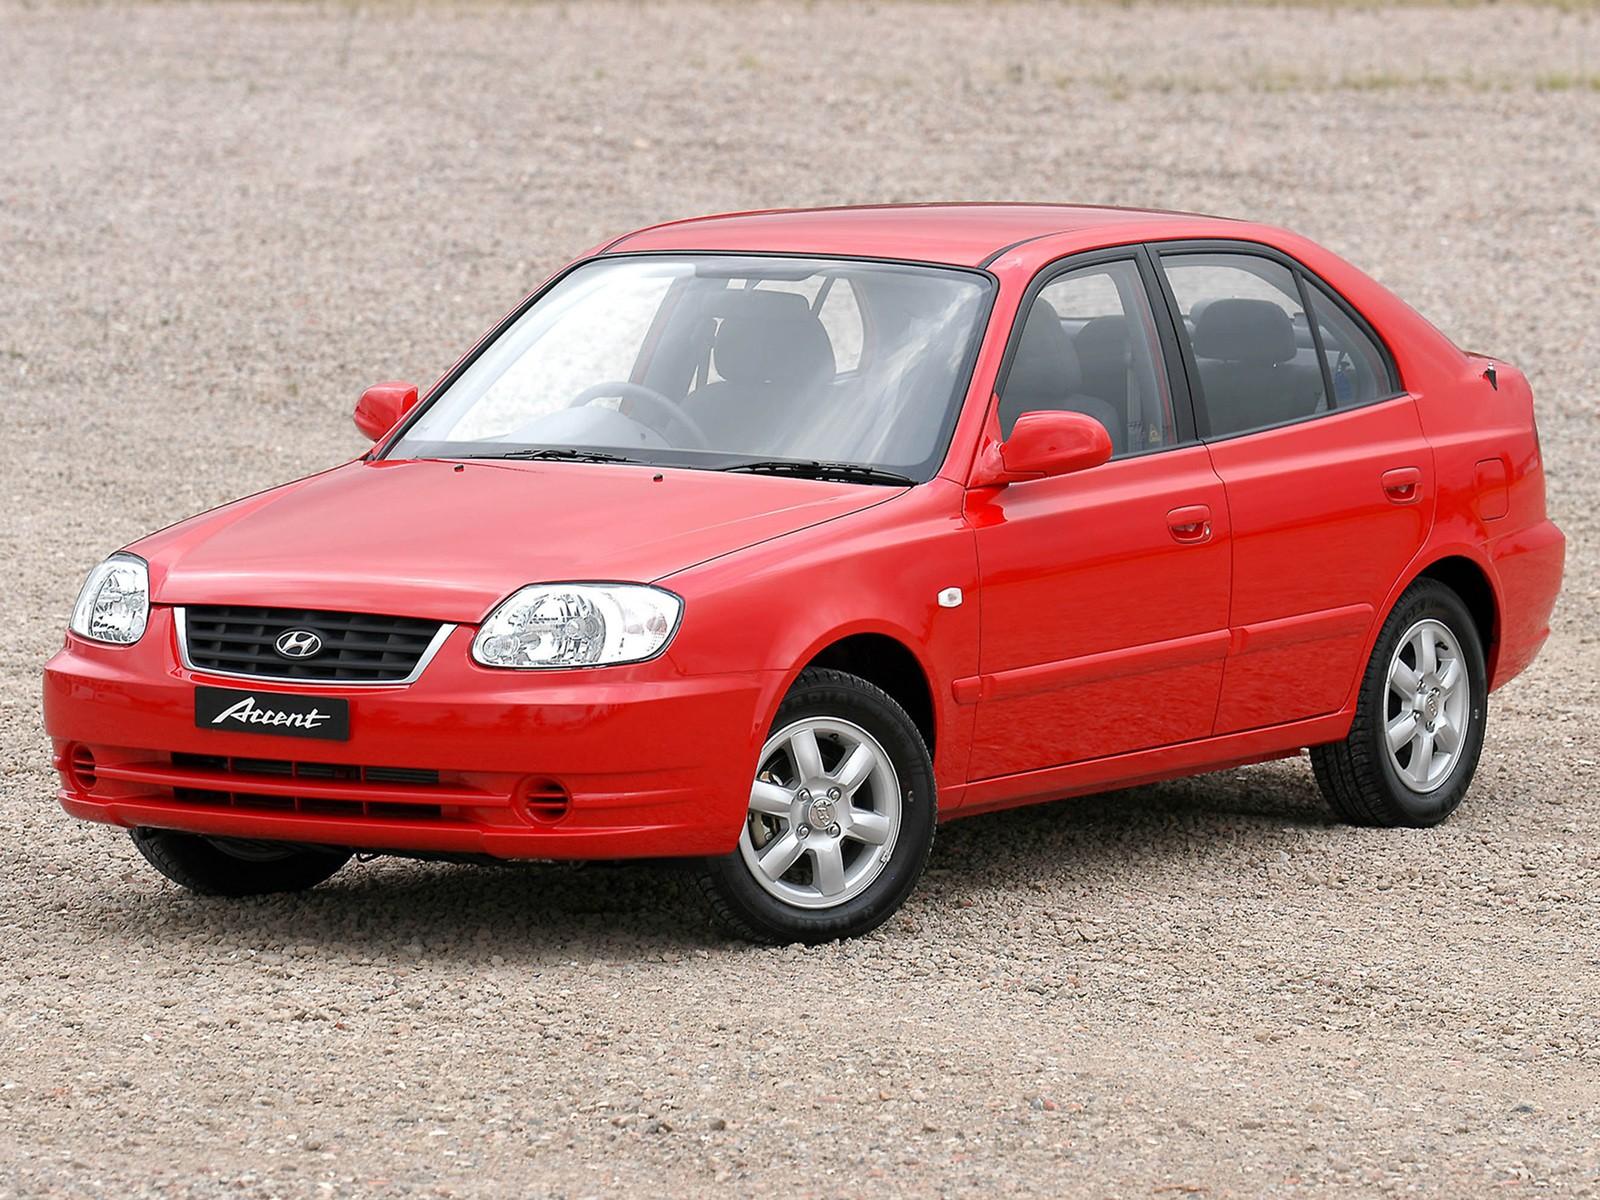 Hyundai Accent Hatchback >> HYUNDAI Accent 5 Doors - 2003, 2004, 2005, 2006 - autoevolution